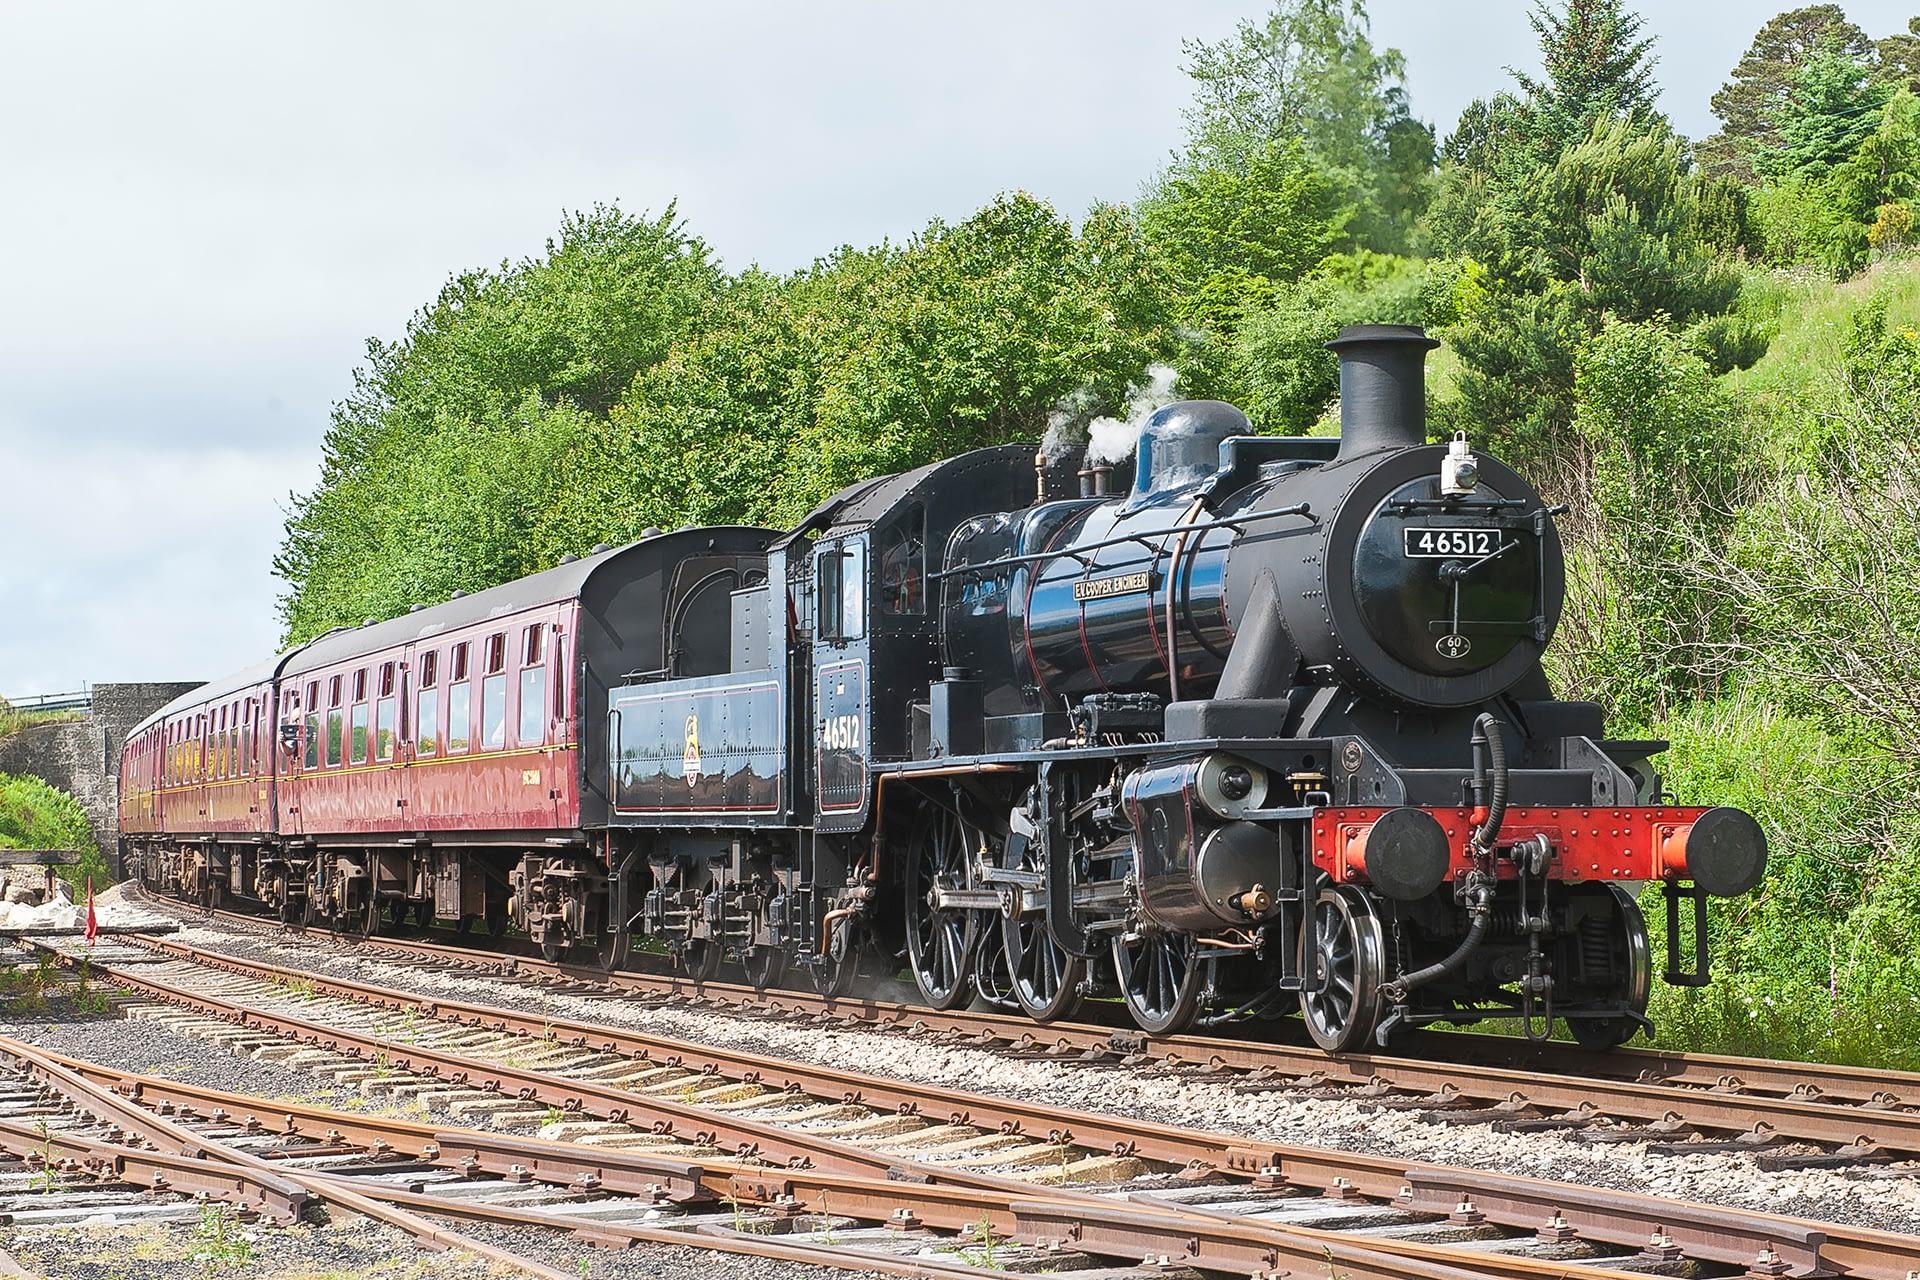 Strathspey Railway, Broomhill Station